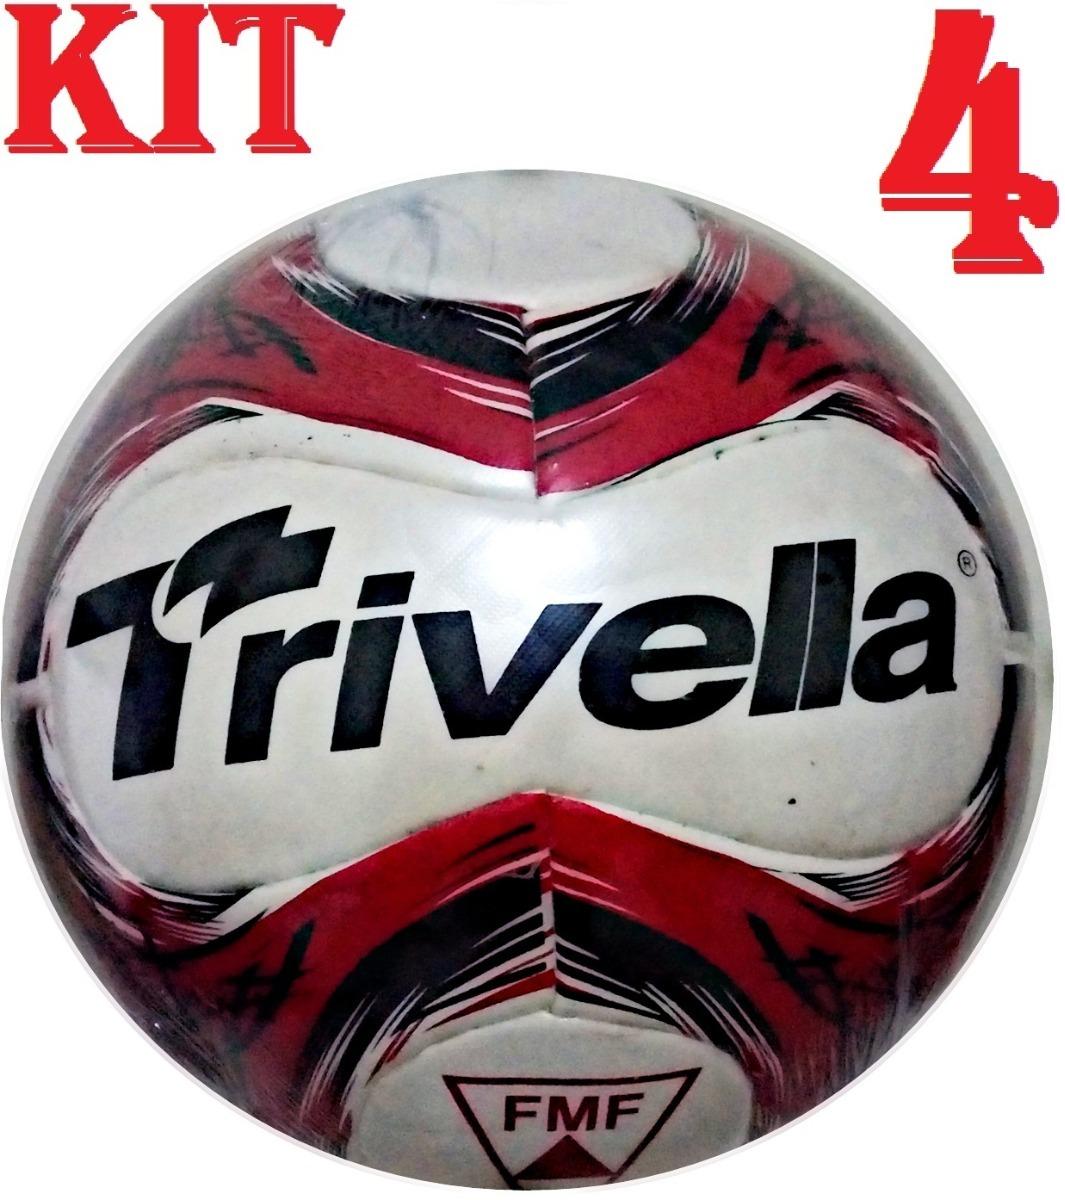 Kit 4 Bolas De Campo 100% Pu Trivella - Brasil Gold - R  260 53694b813419c